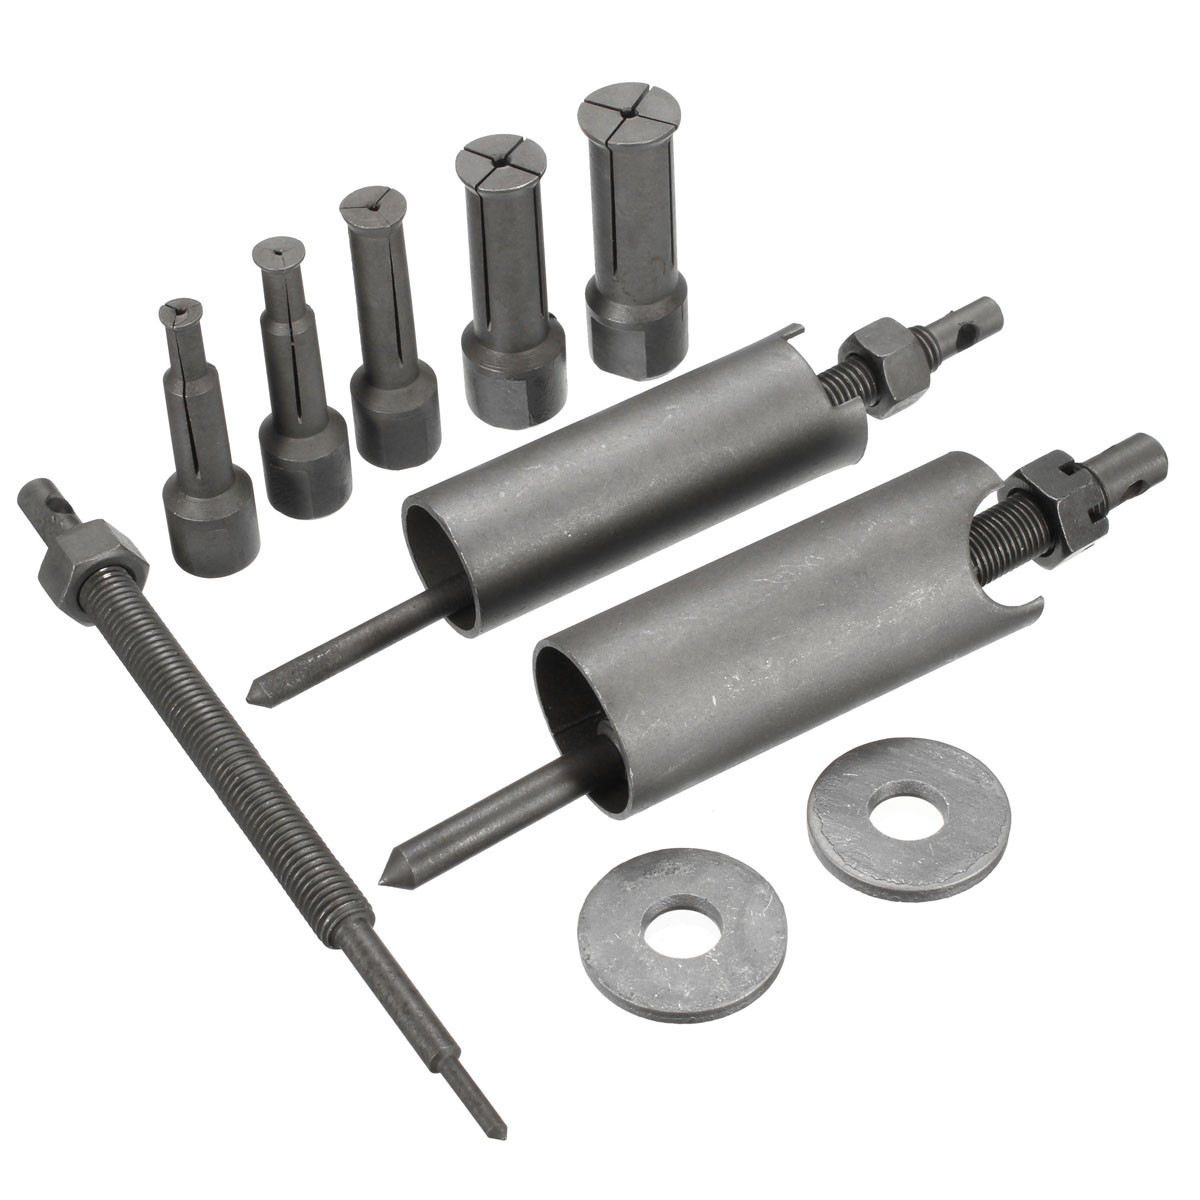 Mofaner 1 Set Stahl Motorrad Auto Inneren Lager Puller Tool Remover Kit 9mm zu 23mm Durchmesser